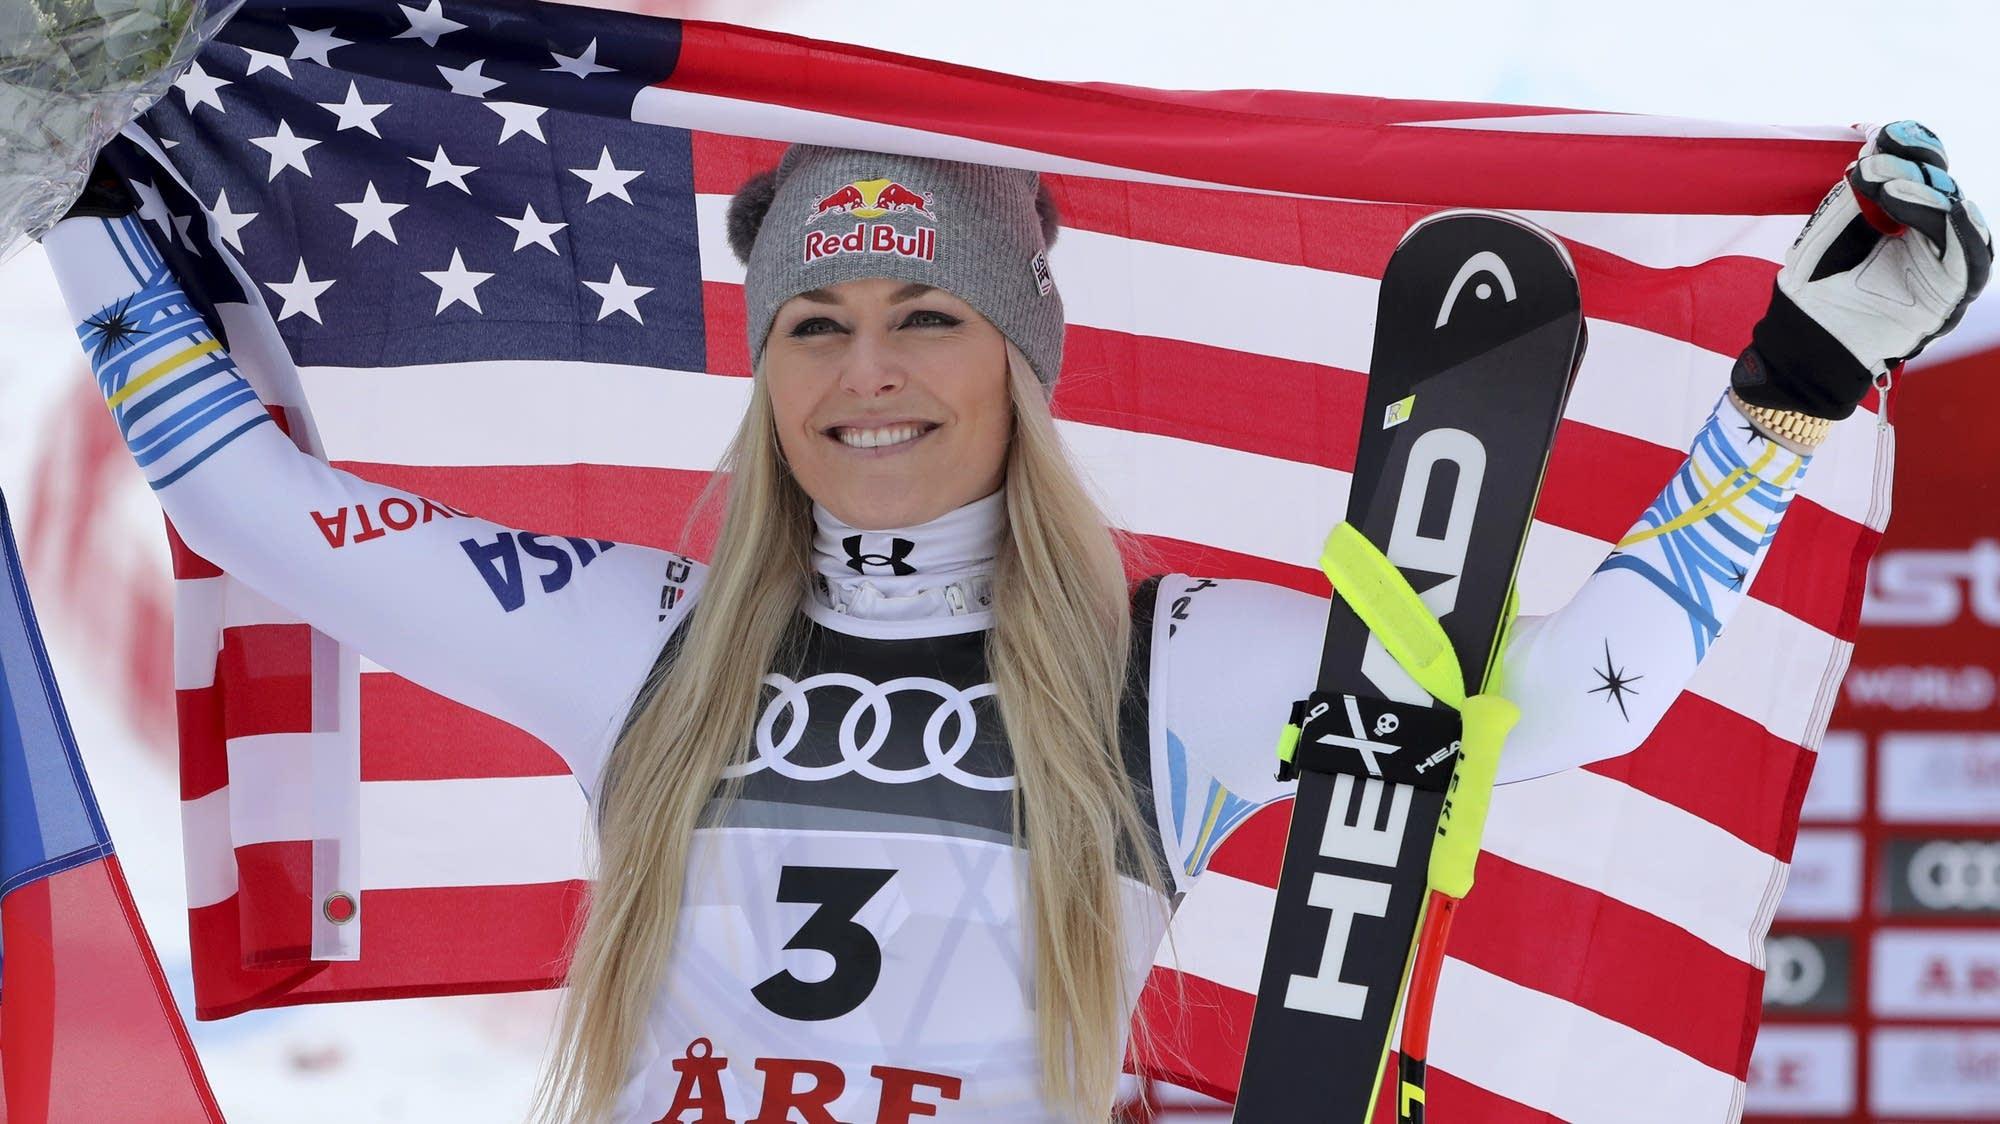 Lindsey Vonn of the U.S. celebrates after winning a bronze medal